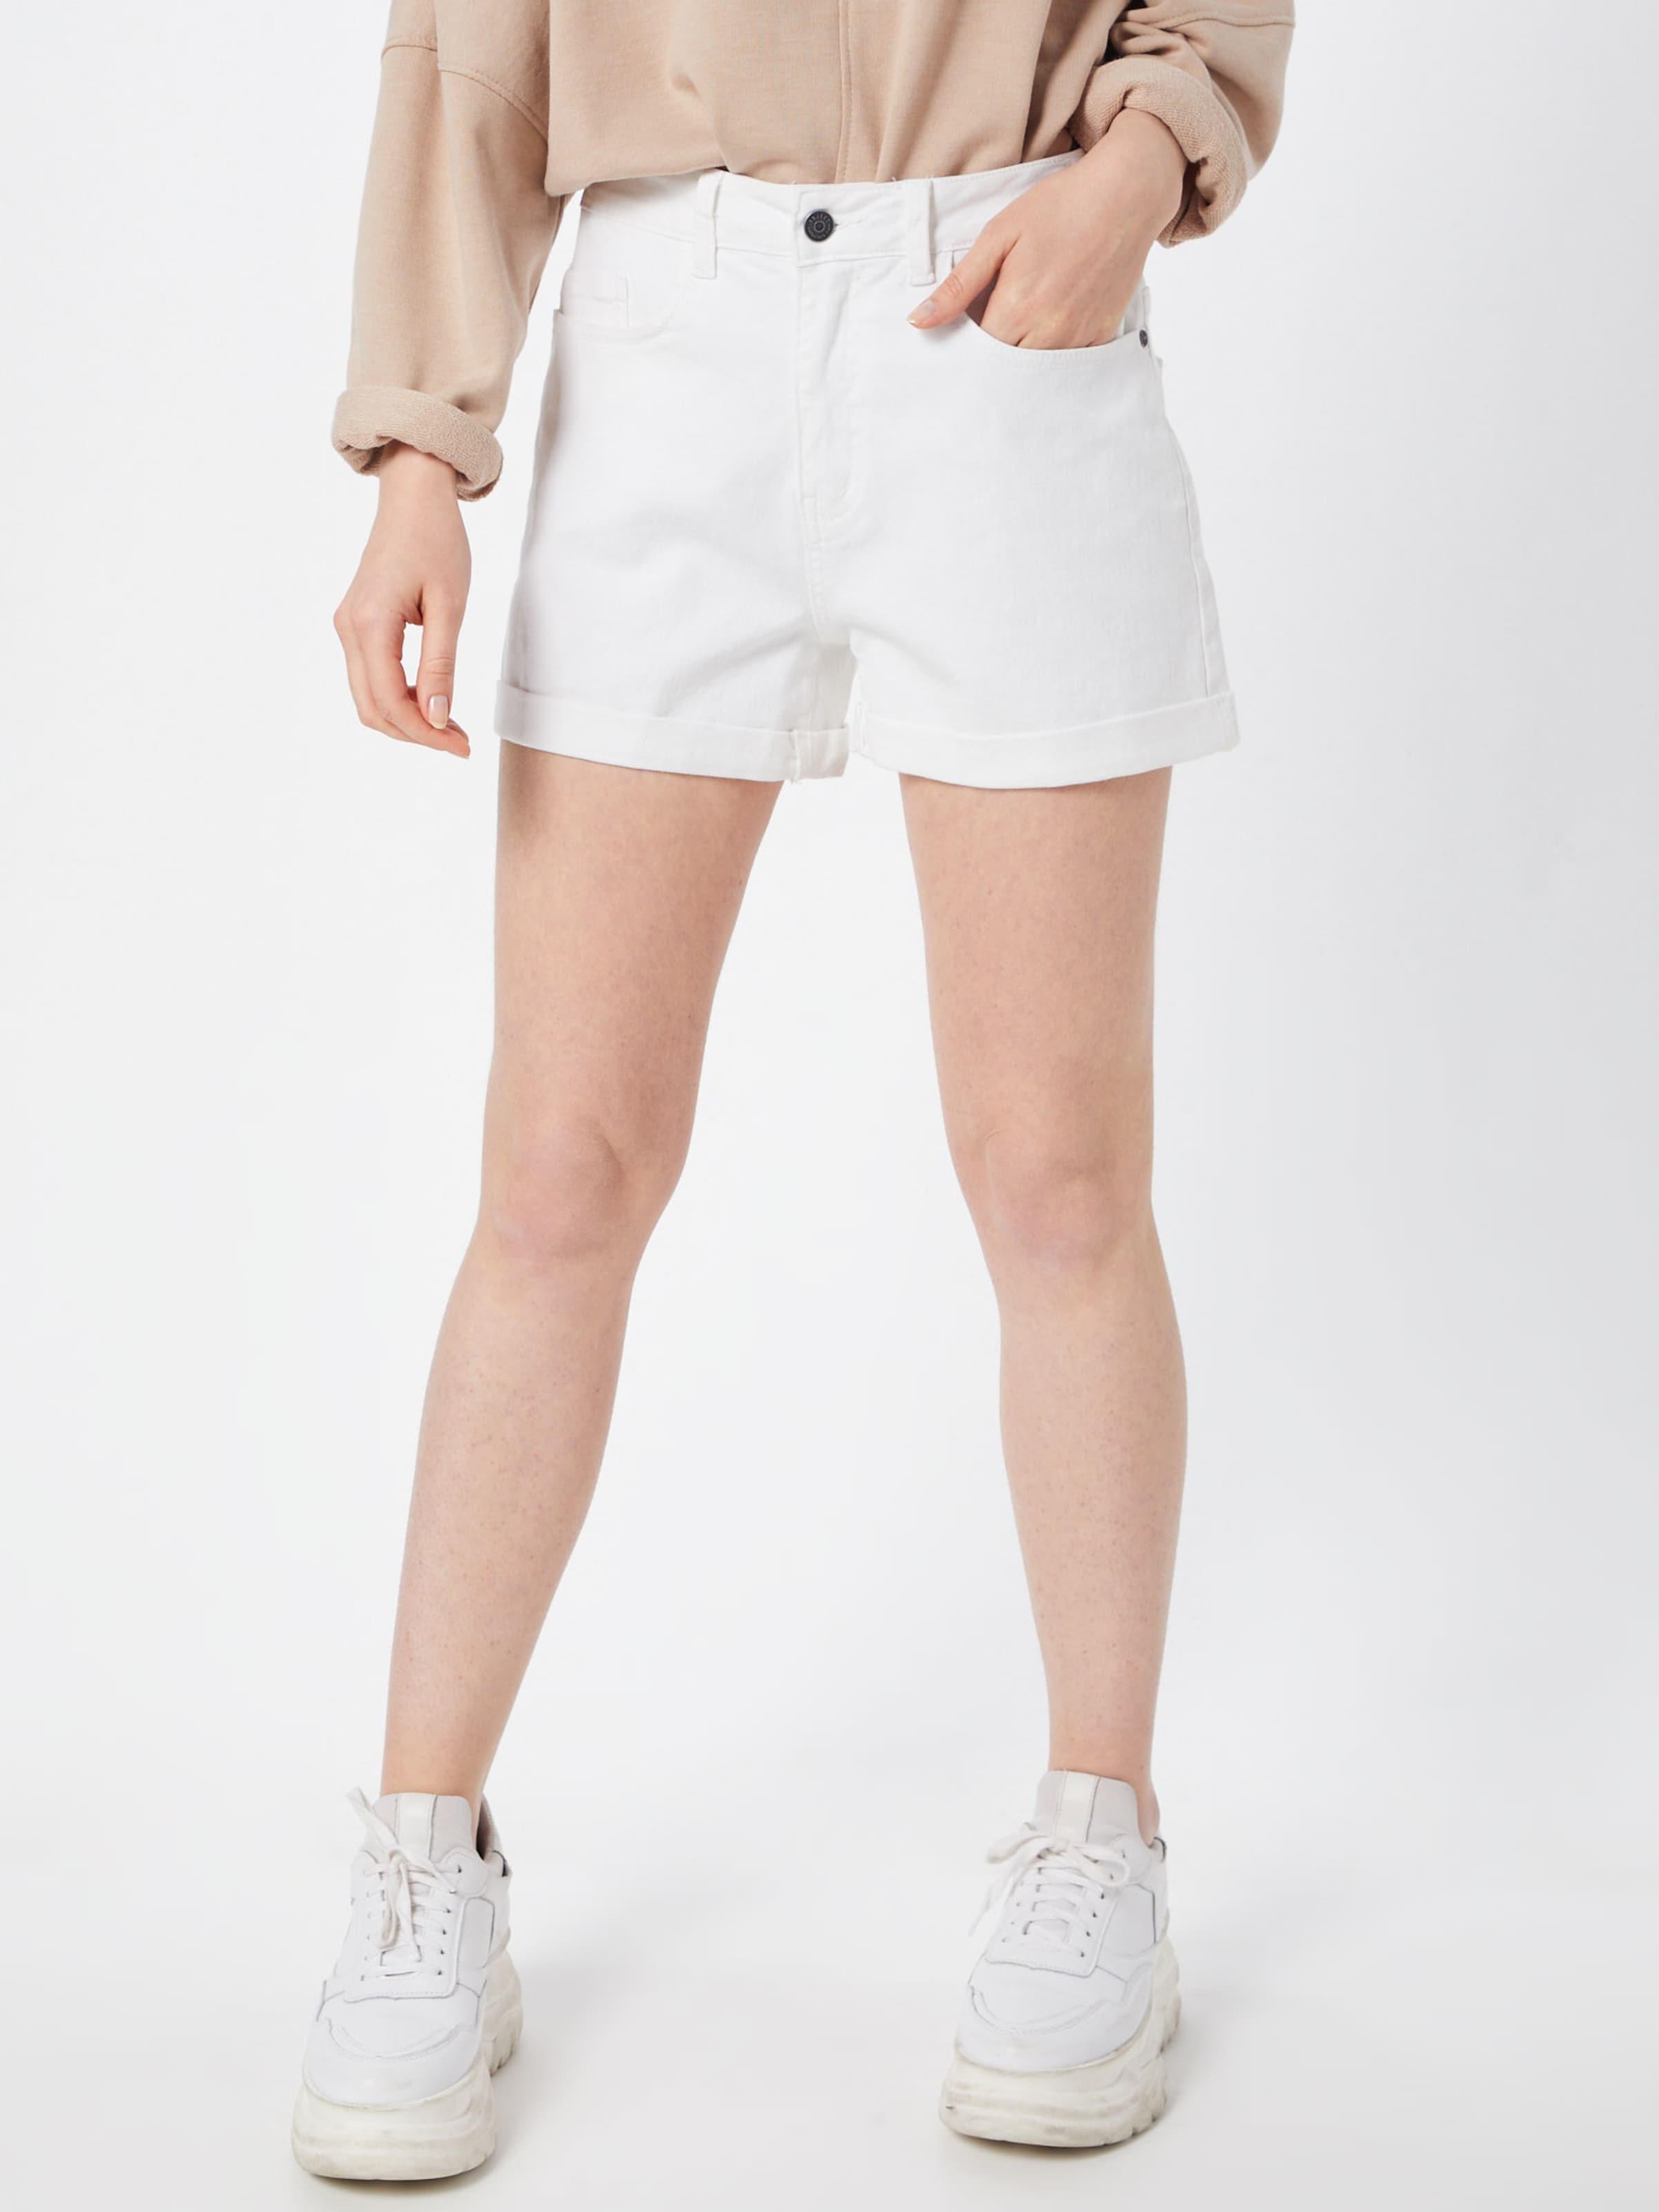 'anna' 'anna' En Blanc Object Object Pantalon Pantalon 76gbfy